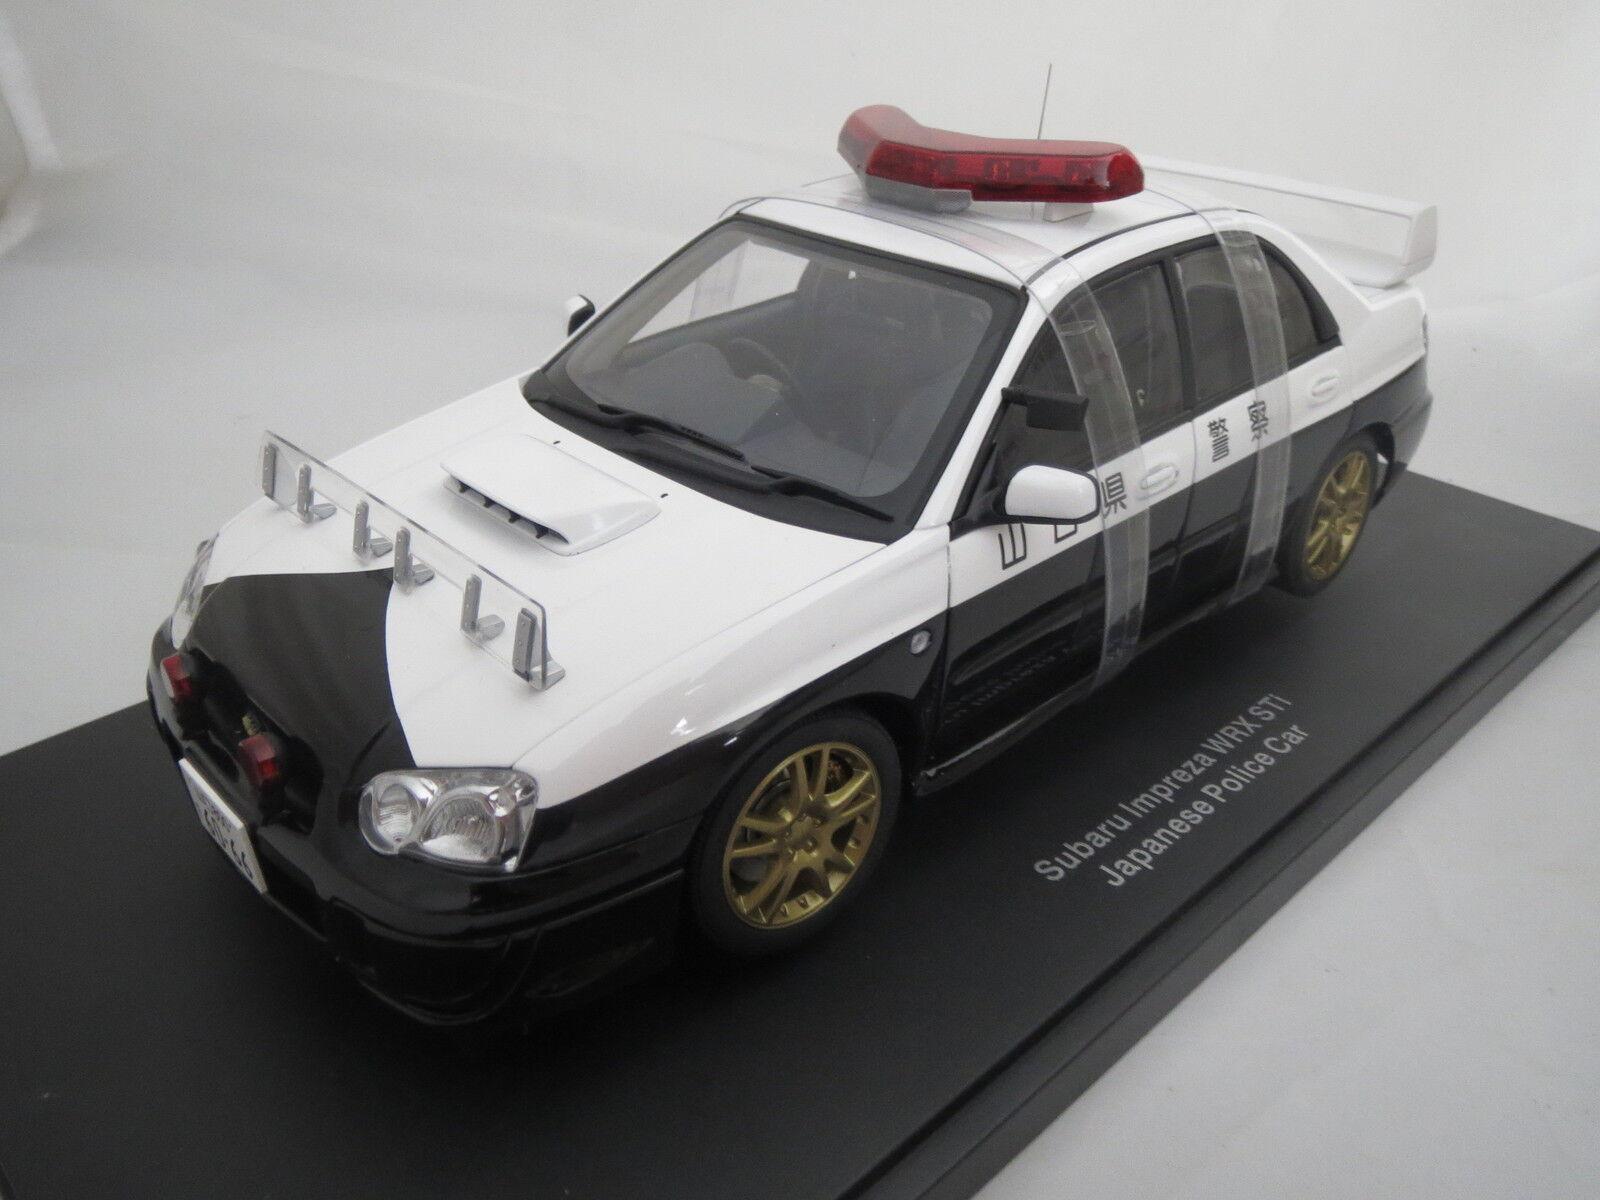 AUTOart 78656 subaru impreza wrx sti Japanese police car 1 18 top & OVP